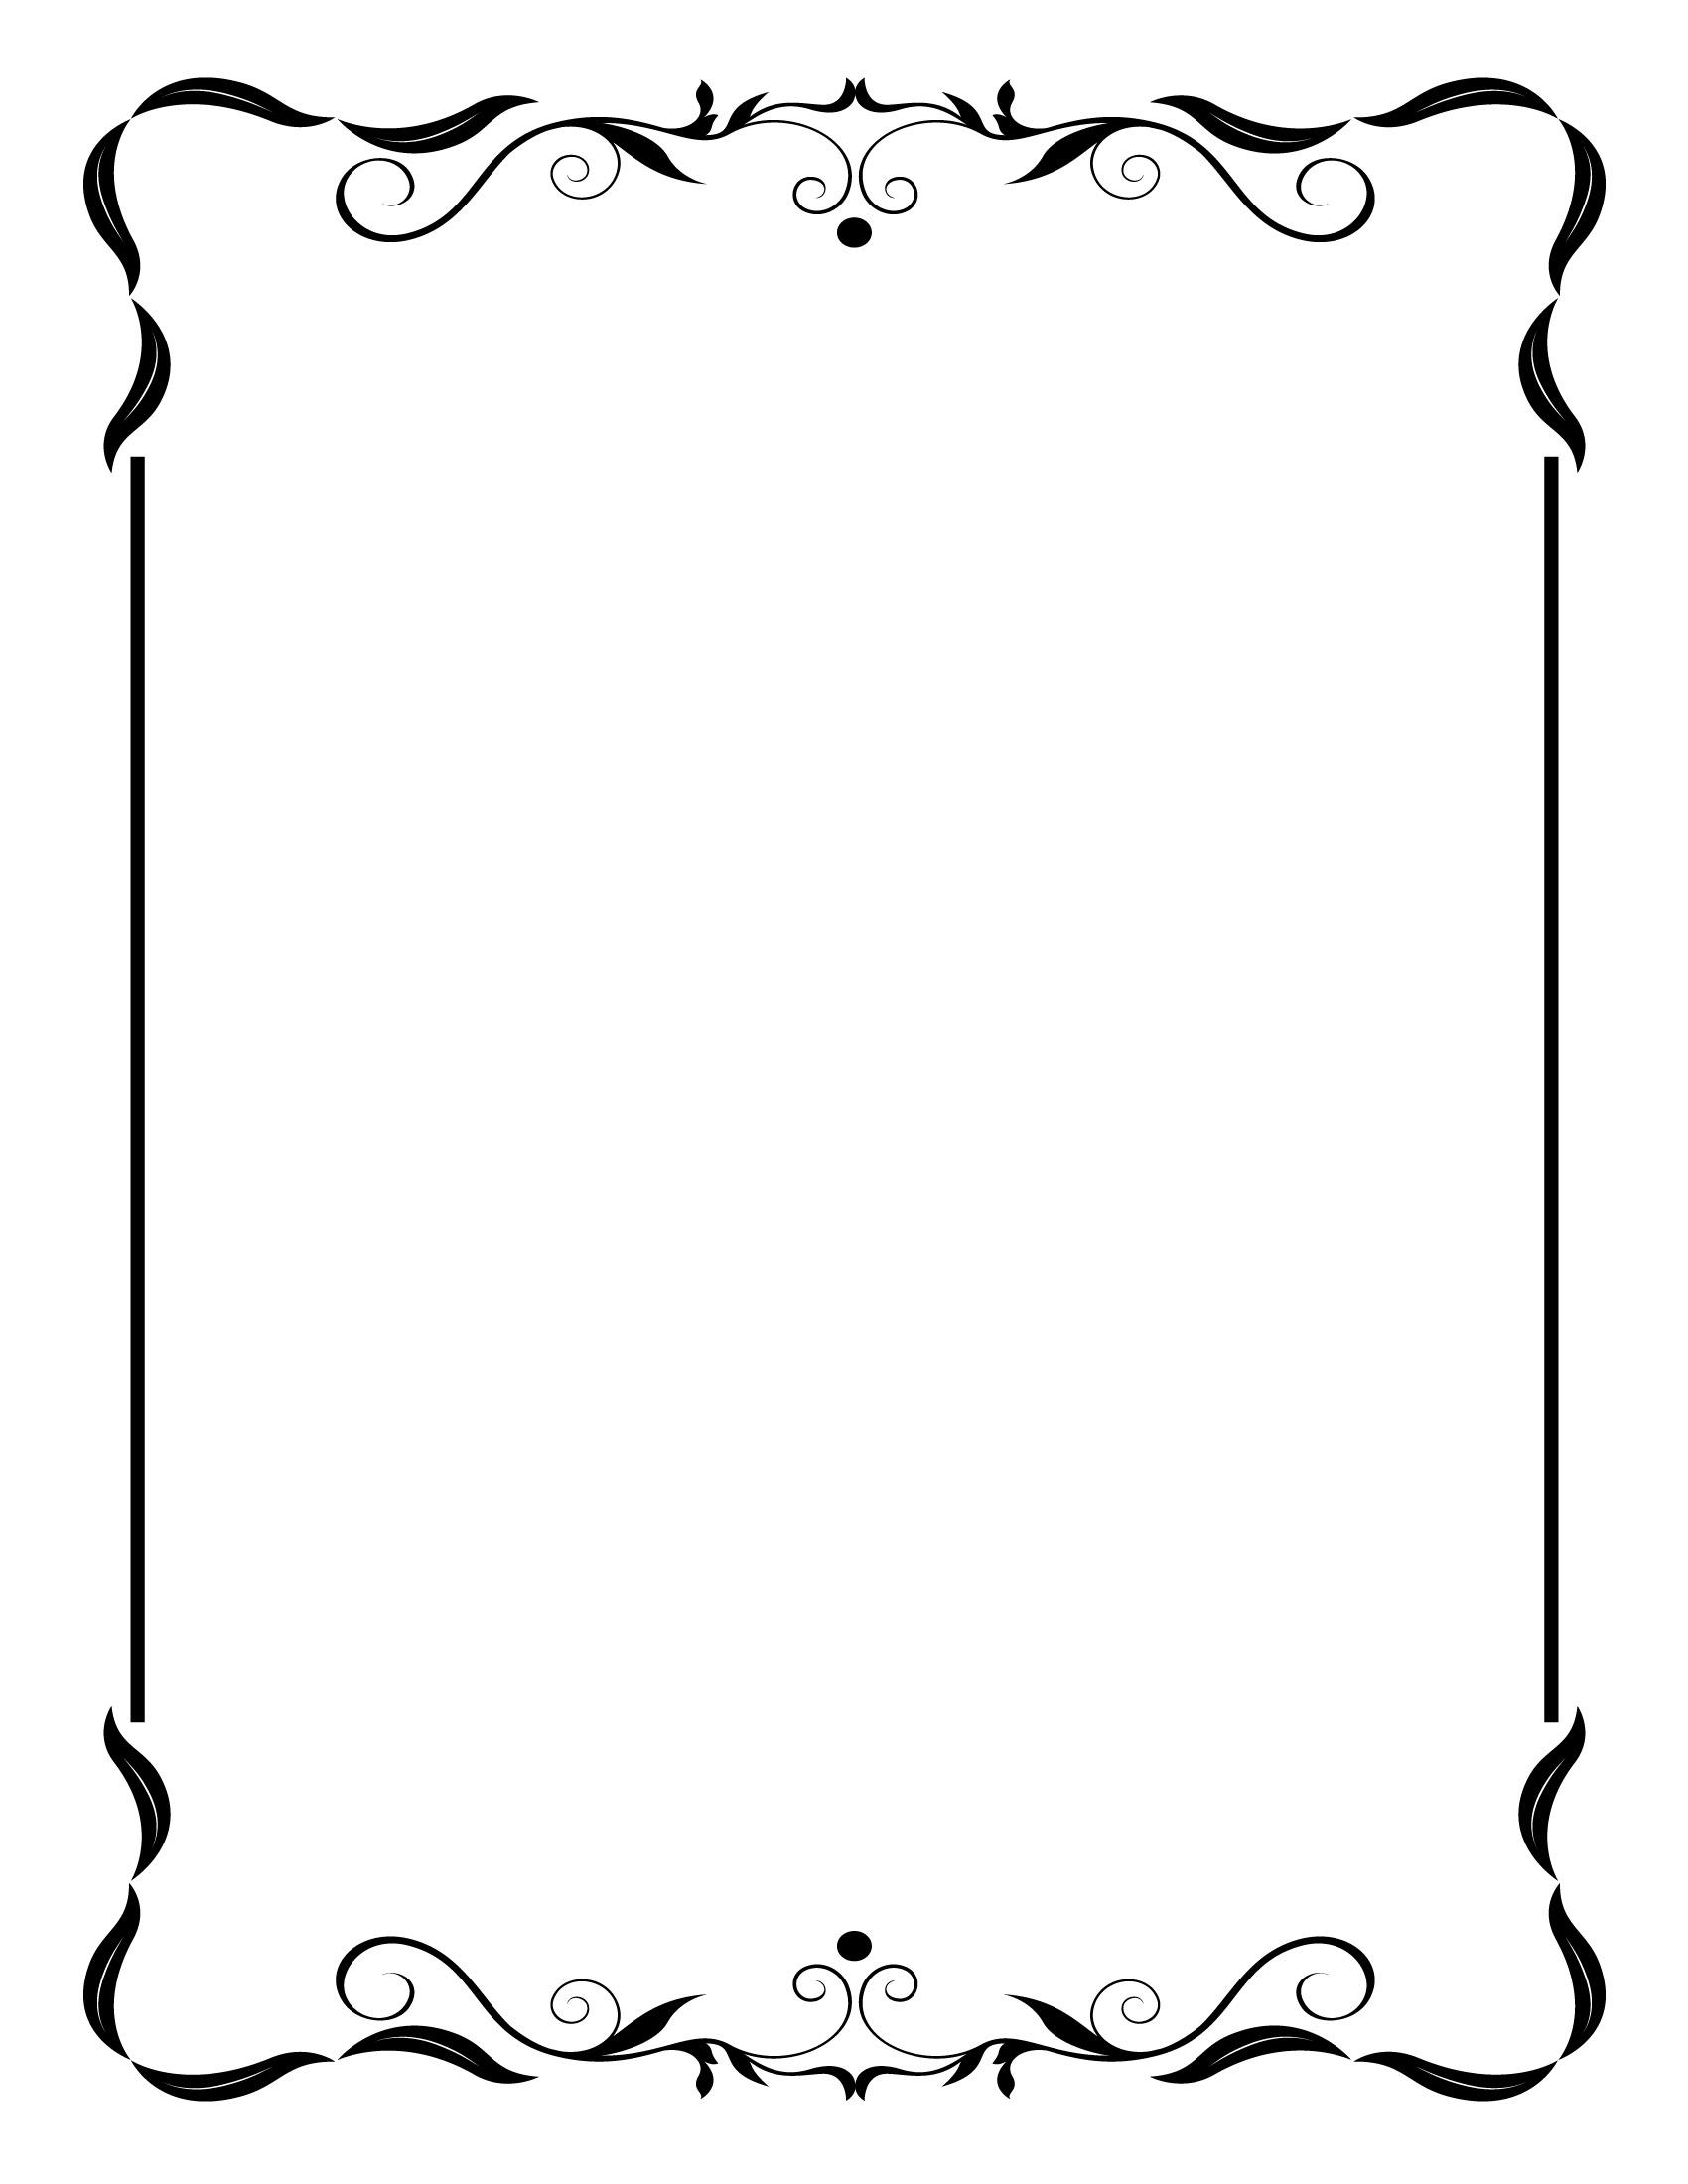 Simple Vintage Frame Border Clip Art N2 free image.